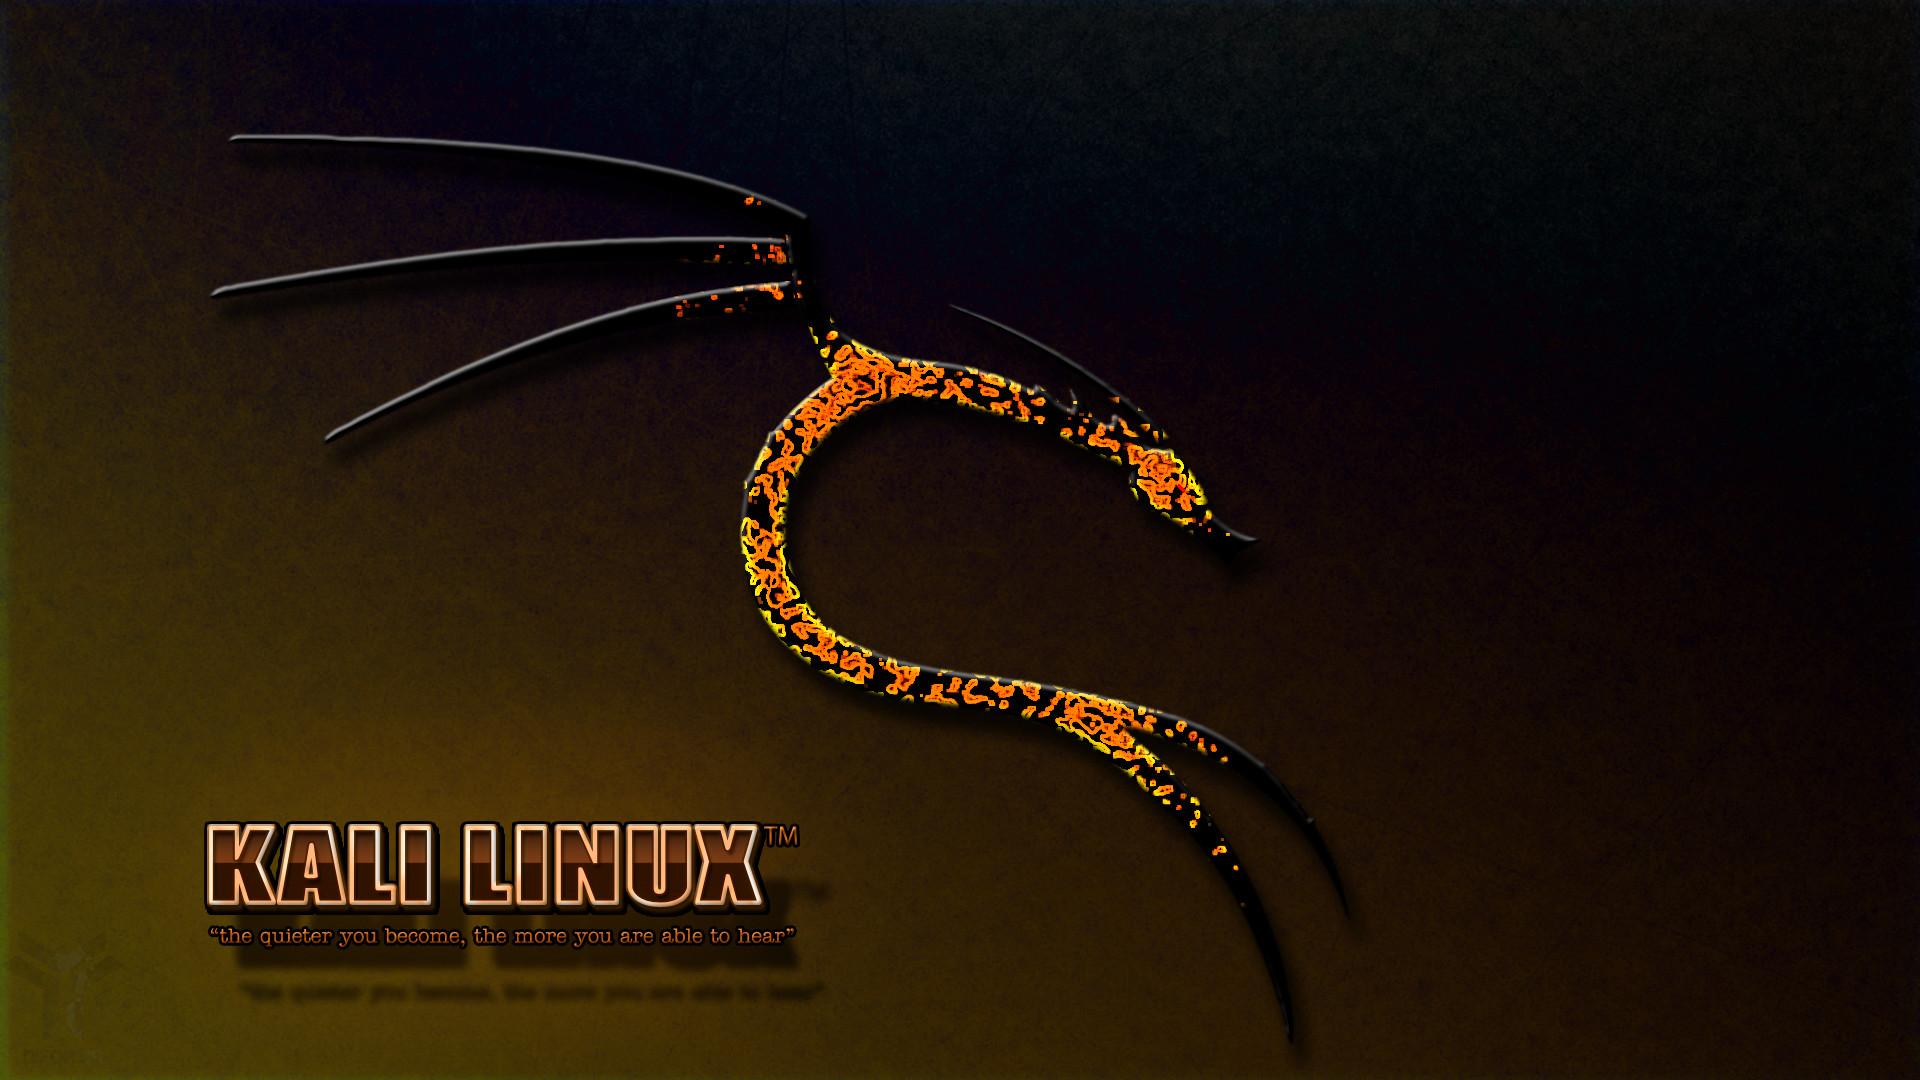 kali linux wallpaper 1920x1080 83 images